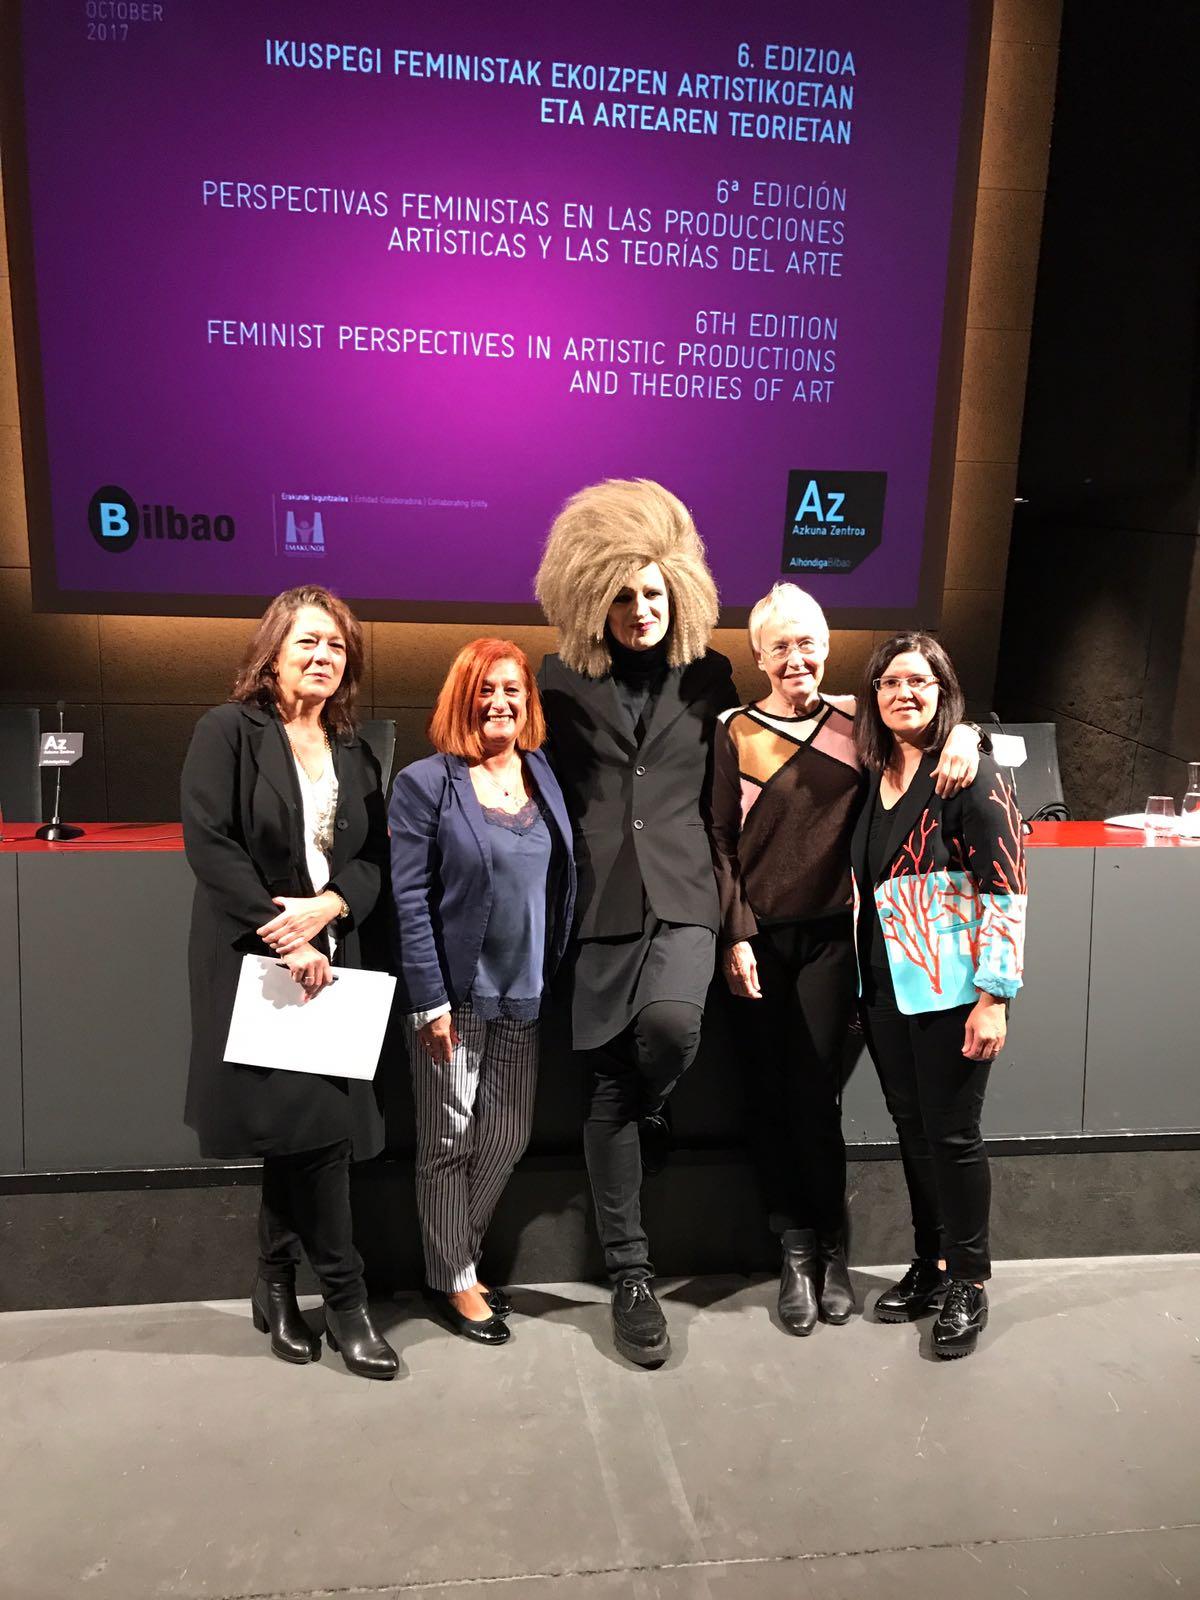 2017-10-27_curso_perspectivas_feministas.jpg